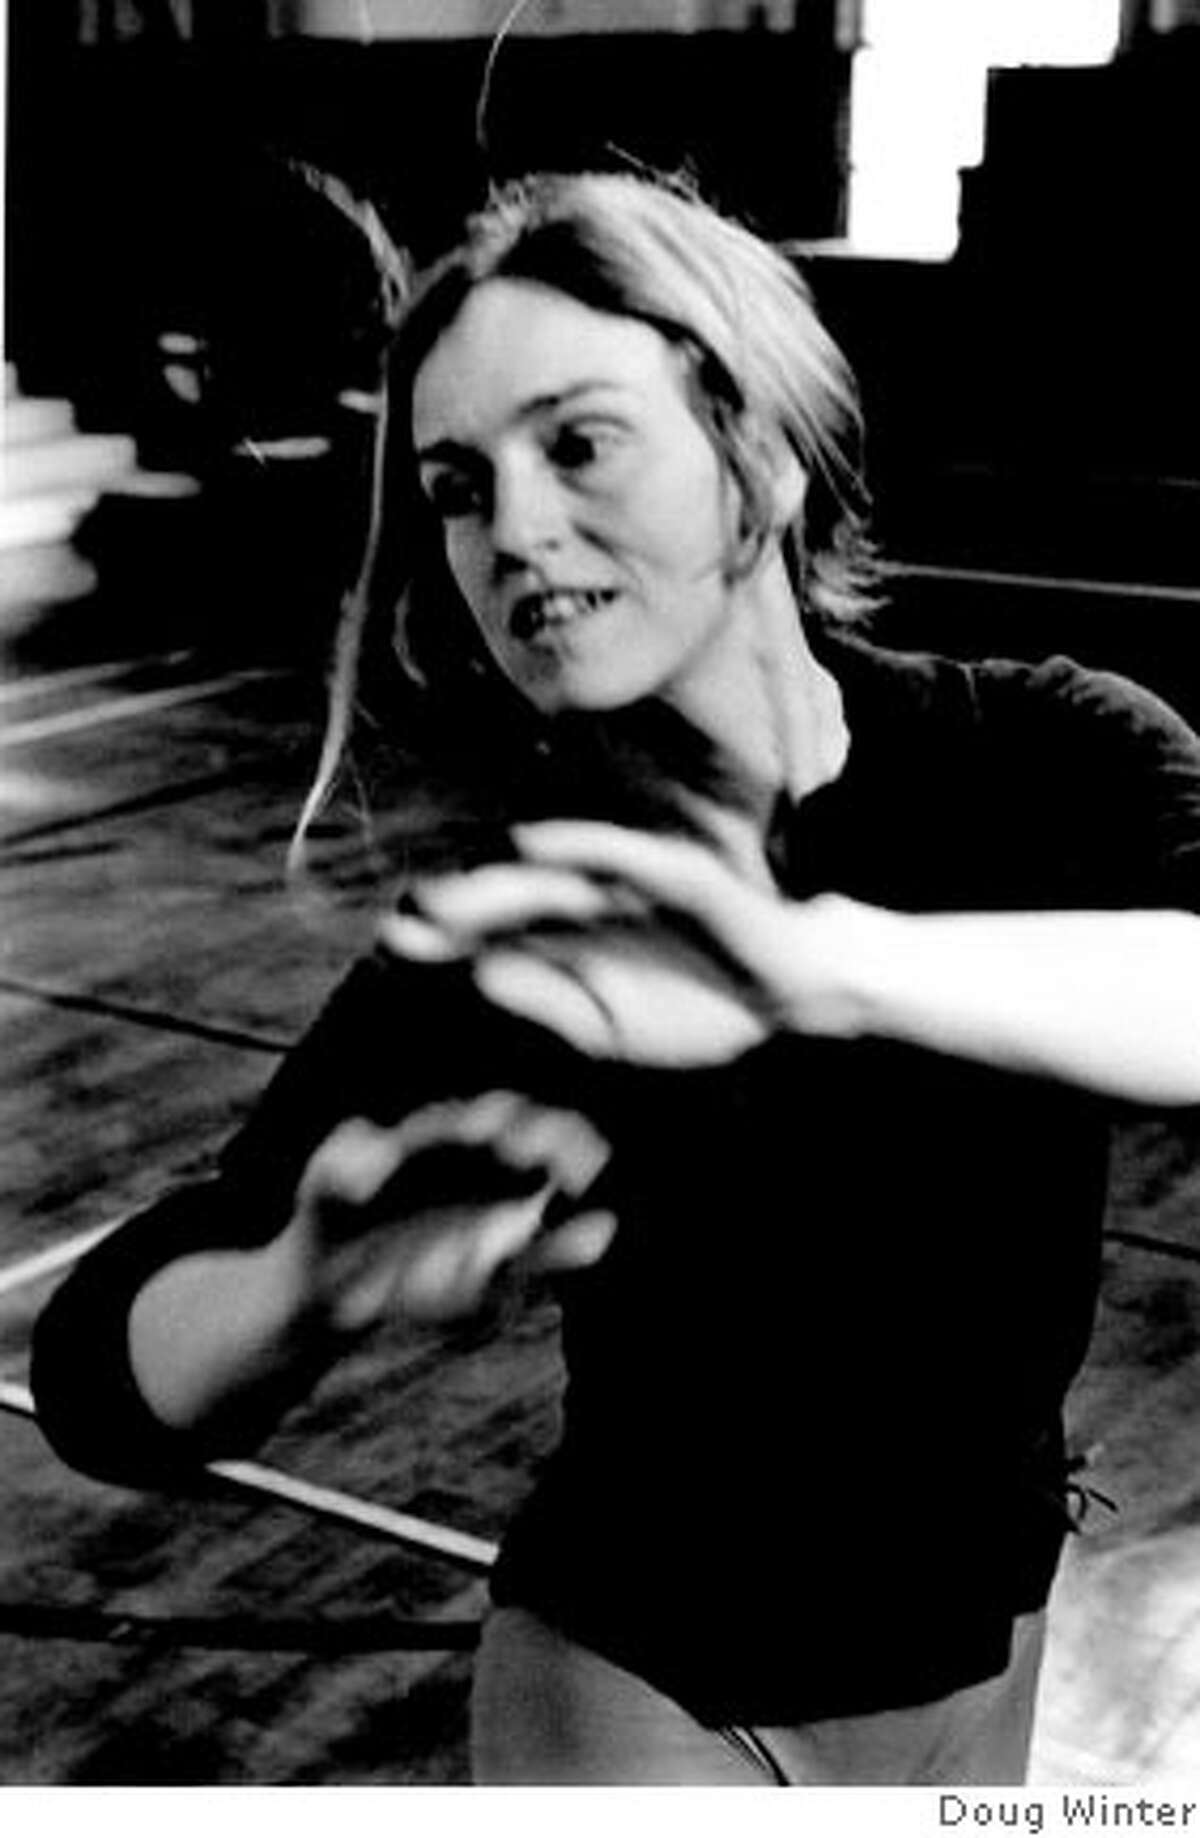 Dancer Brenda Way. Photo credit: Doug Winter (taken around 1971 at Oberlin College).